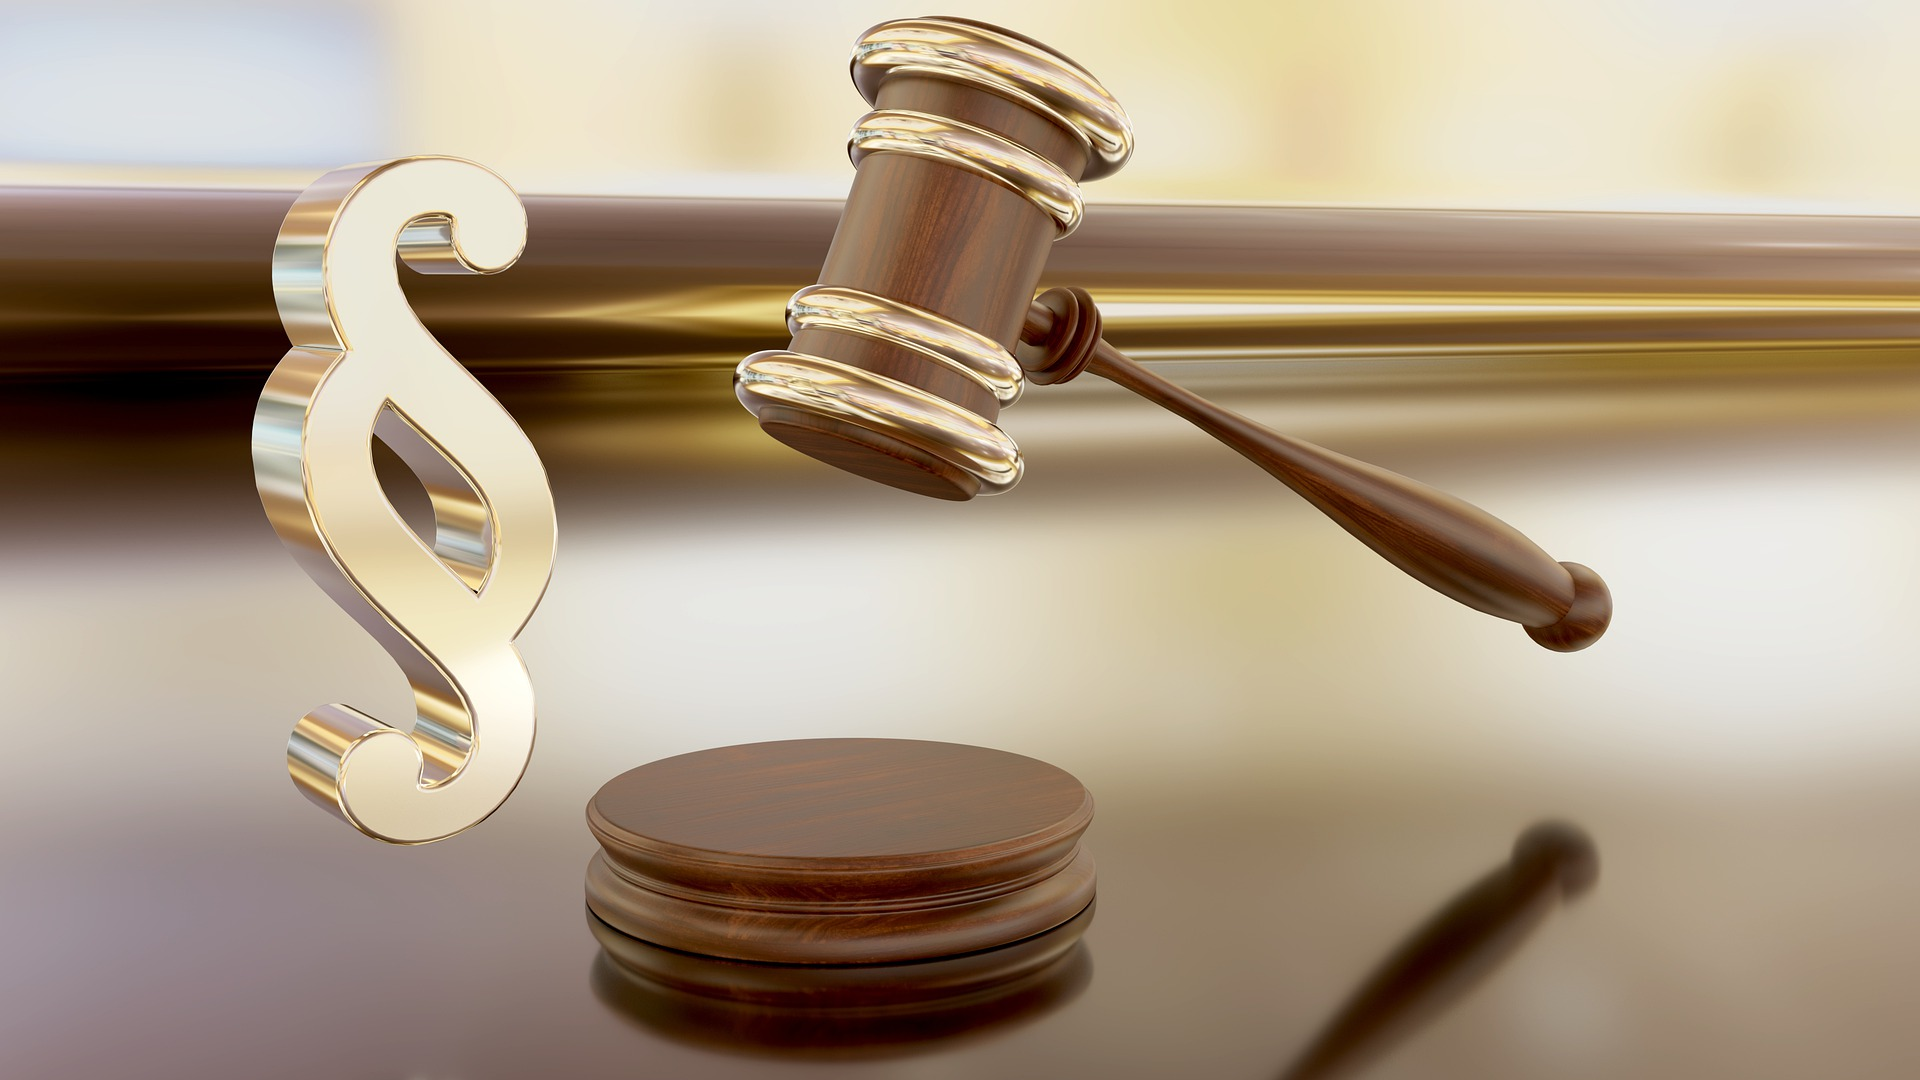 pojištěni pravni ochrany svycarsko rechtsschutzversicherung